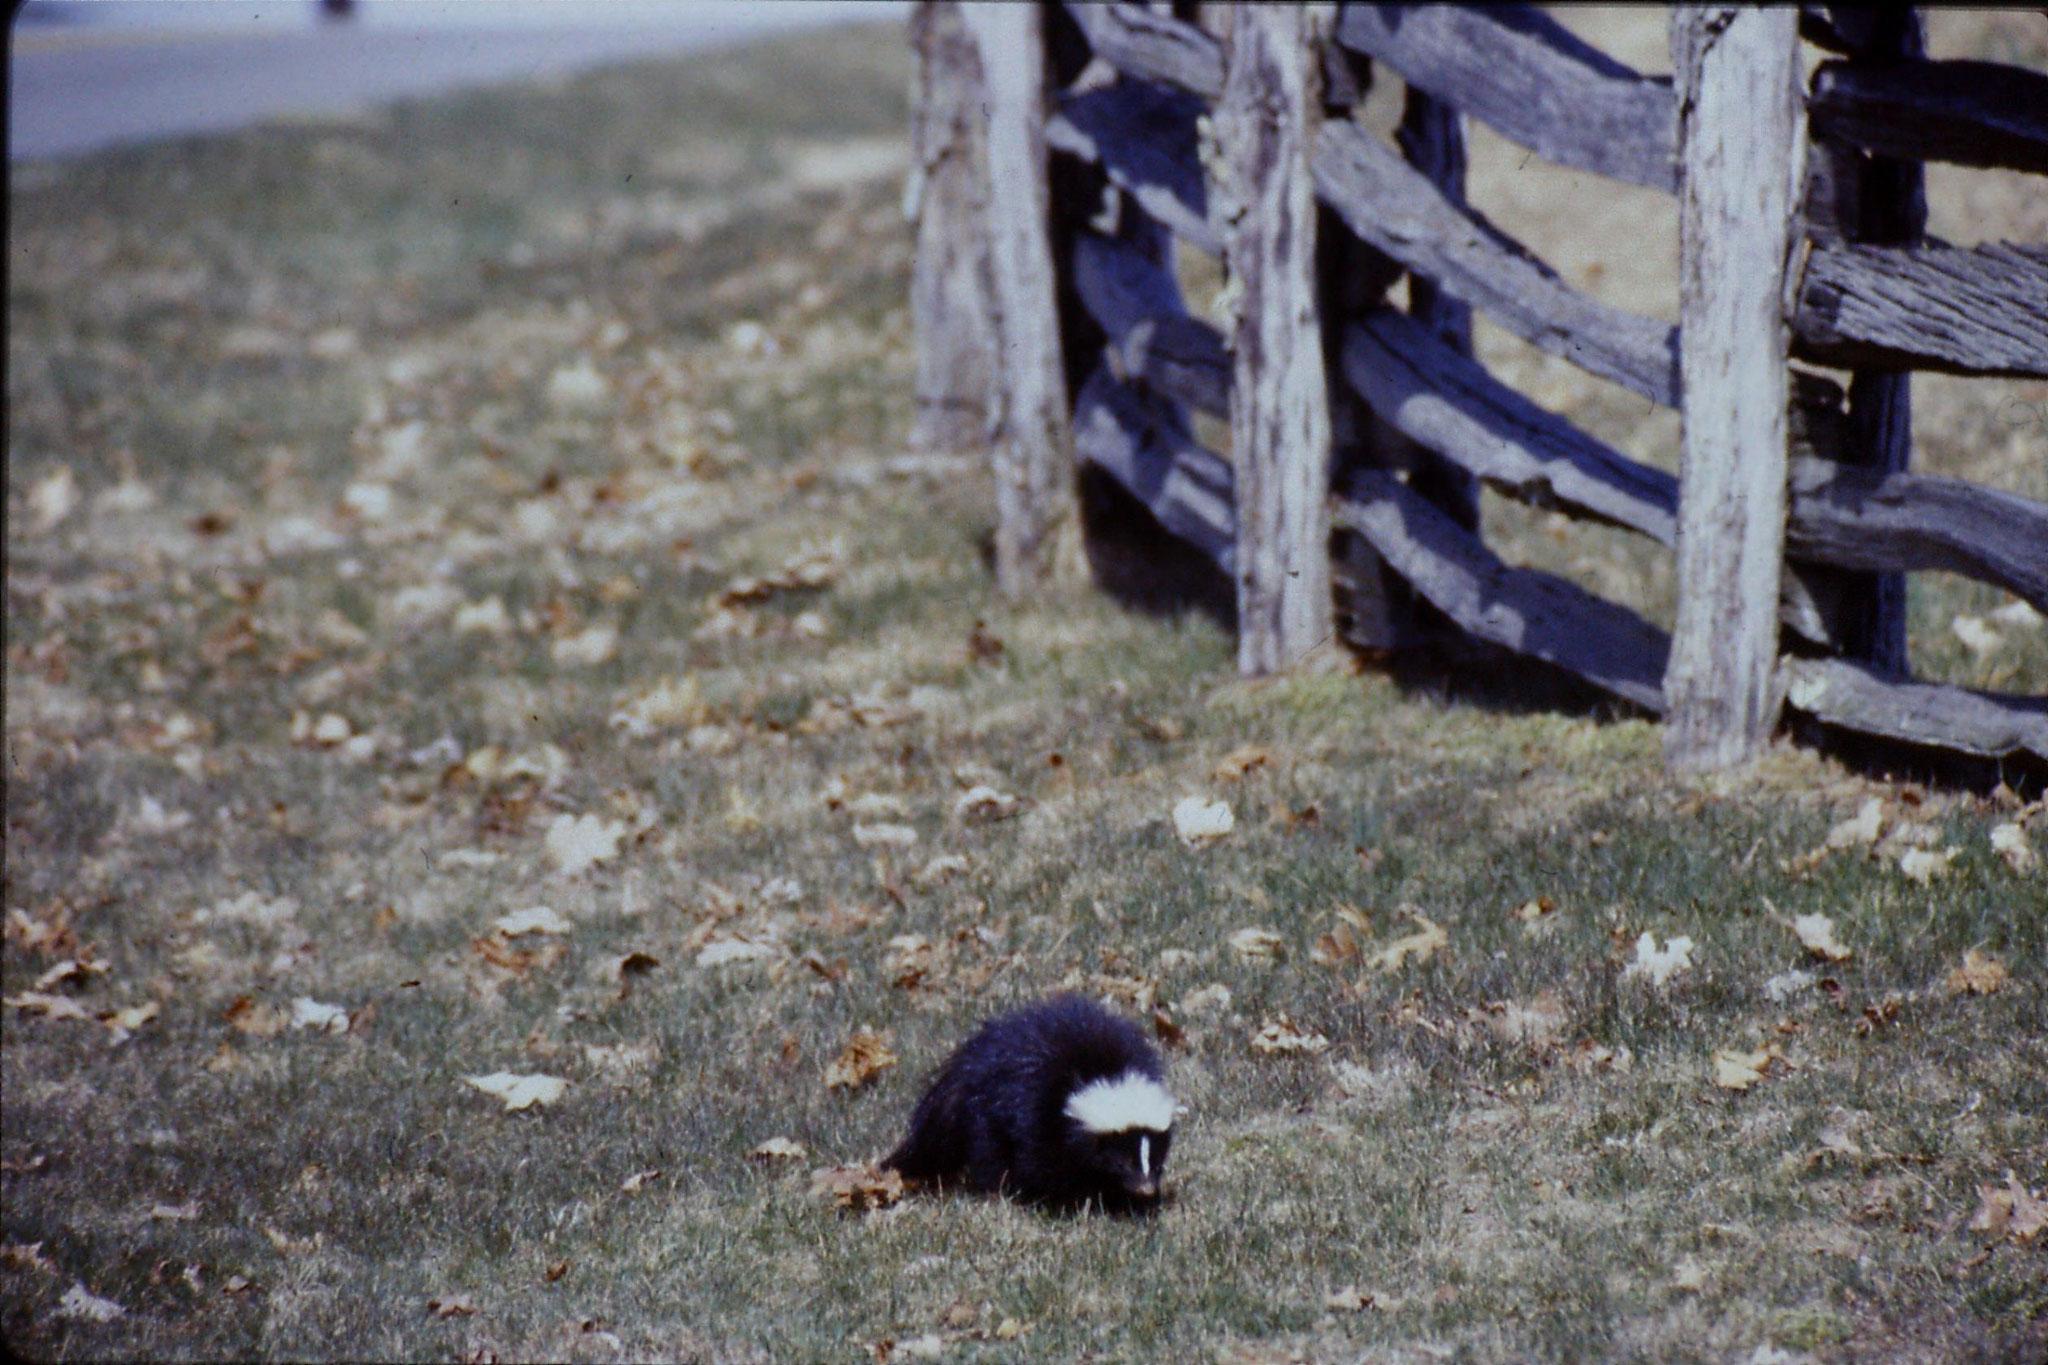 17/3/1991: 26: Benge Gap skunk